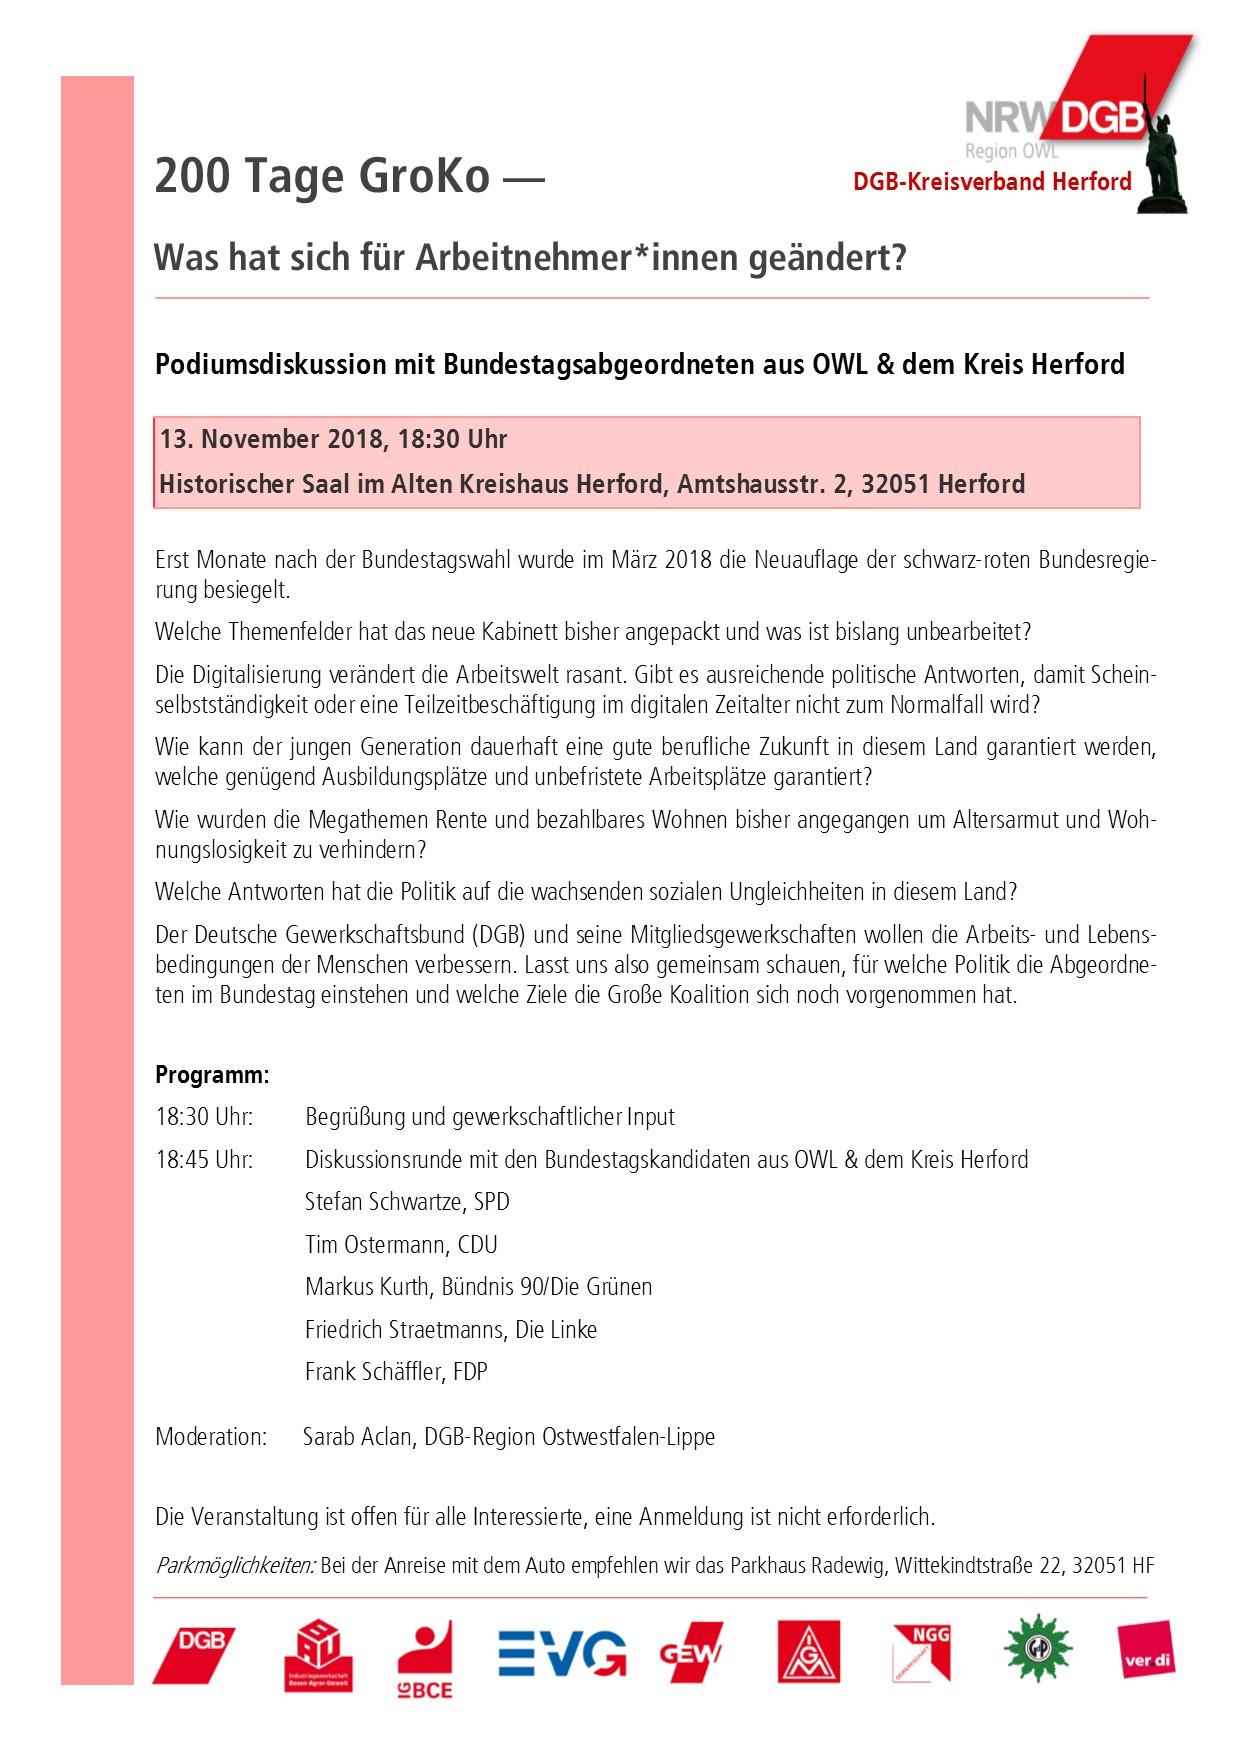 Einladung 200 Tage GroKo 13.11.2018